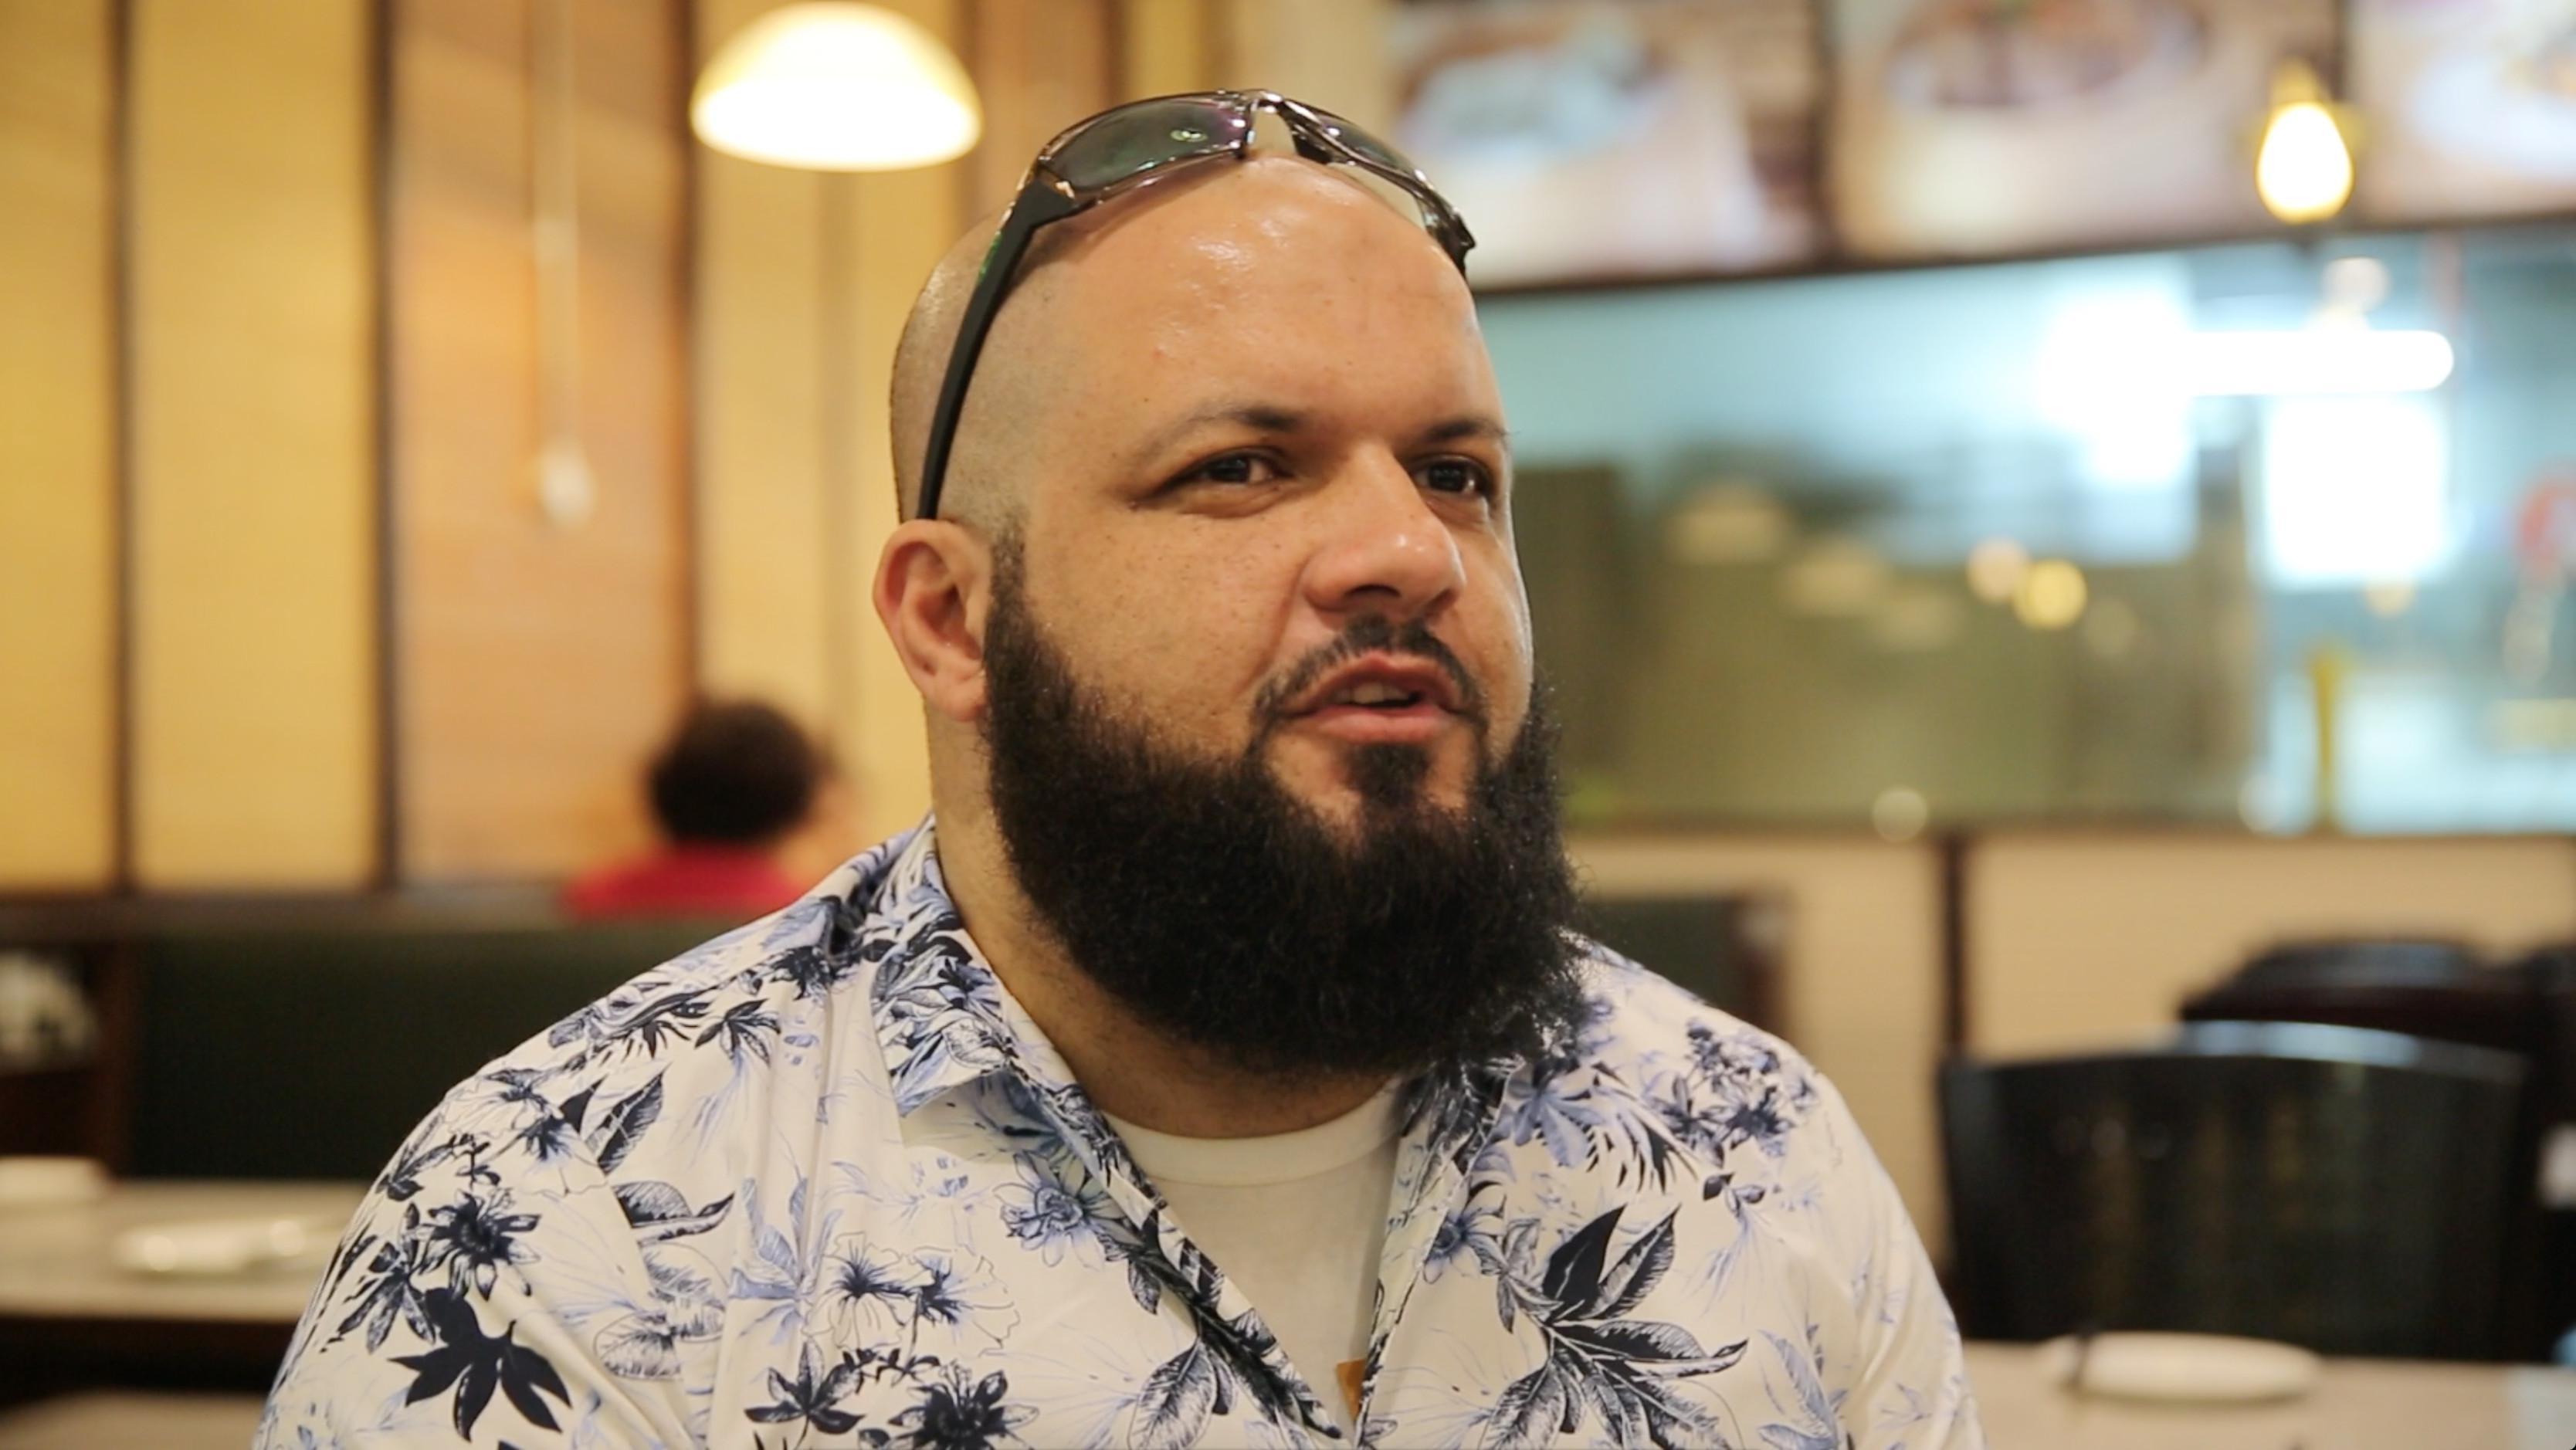 Pengusaha asal Mesir Ahmes Saber Amin mengukapkan bahwa First Travel berhutan padanya hingga Rp 25 Miliar (Liputan6.com/ Riki Dhanu)